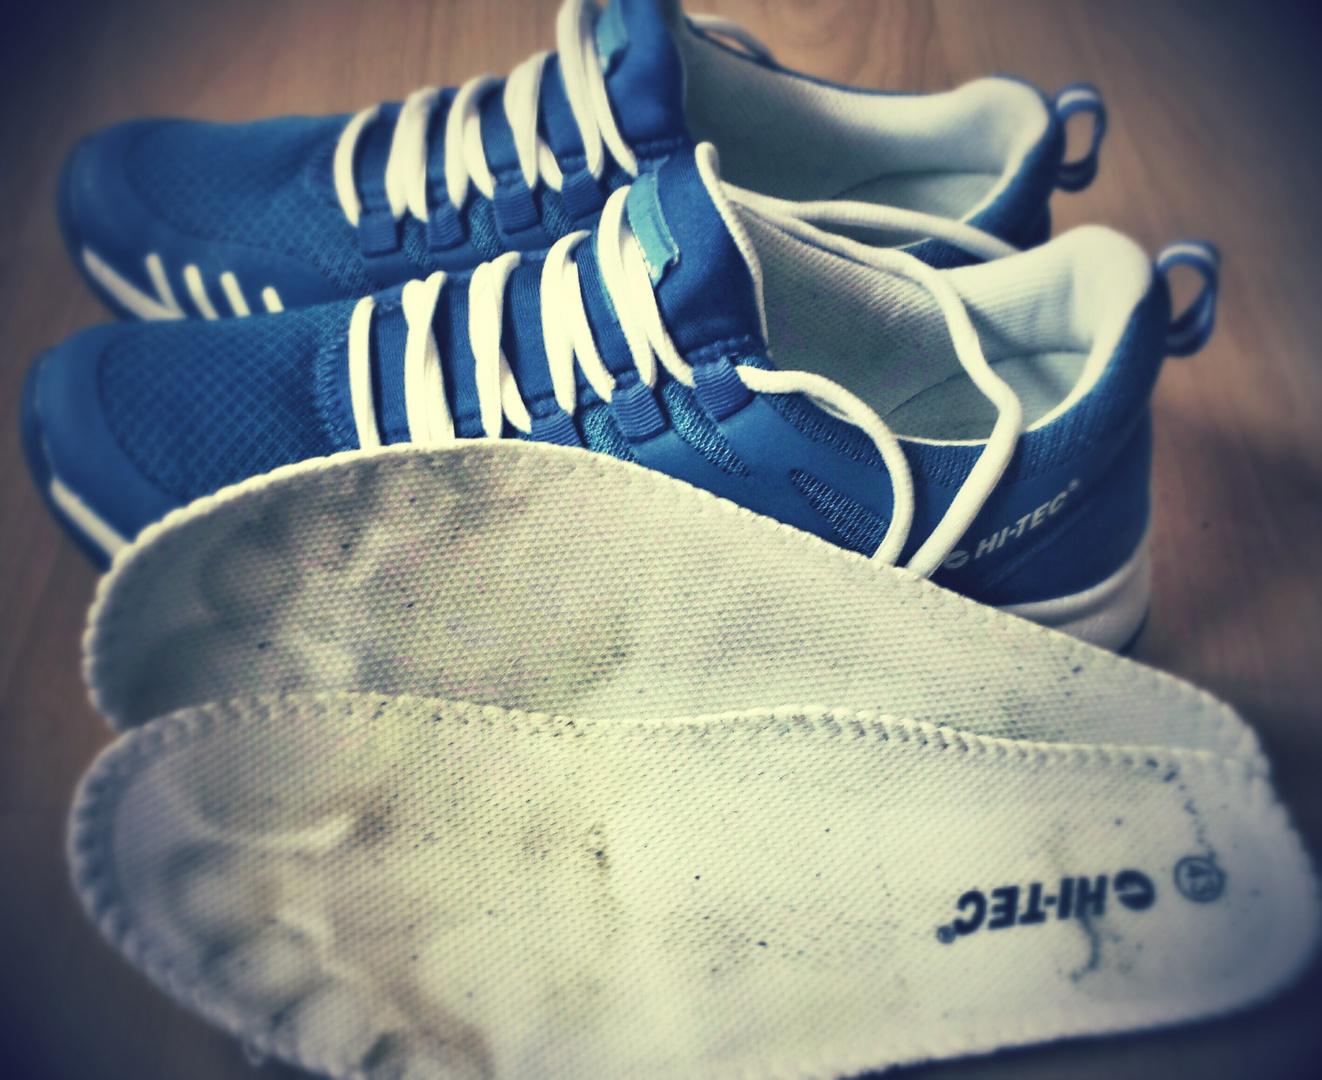 Sweaty Running Shoes